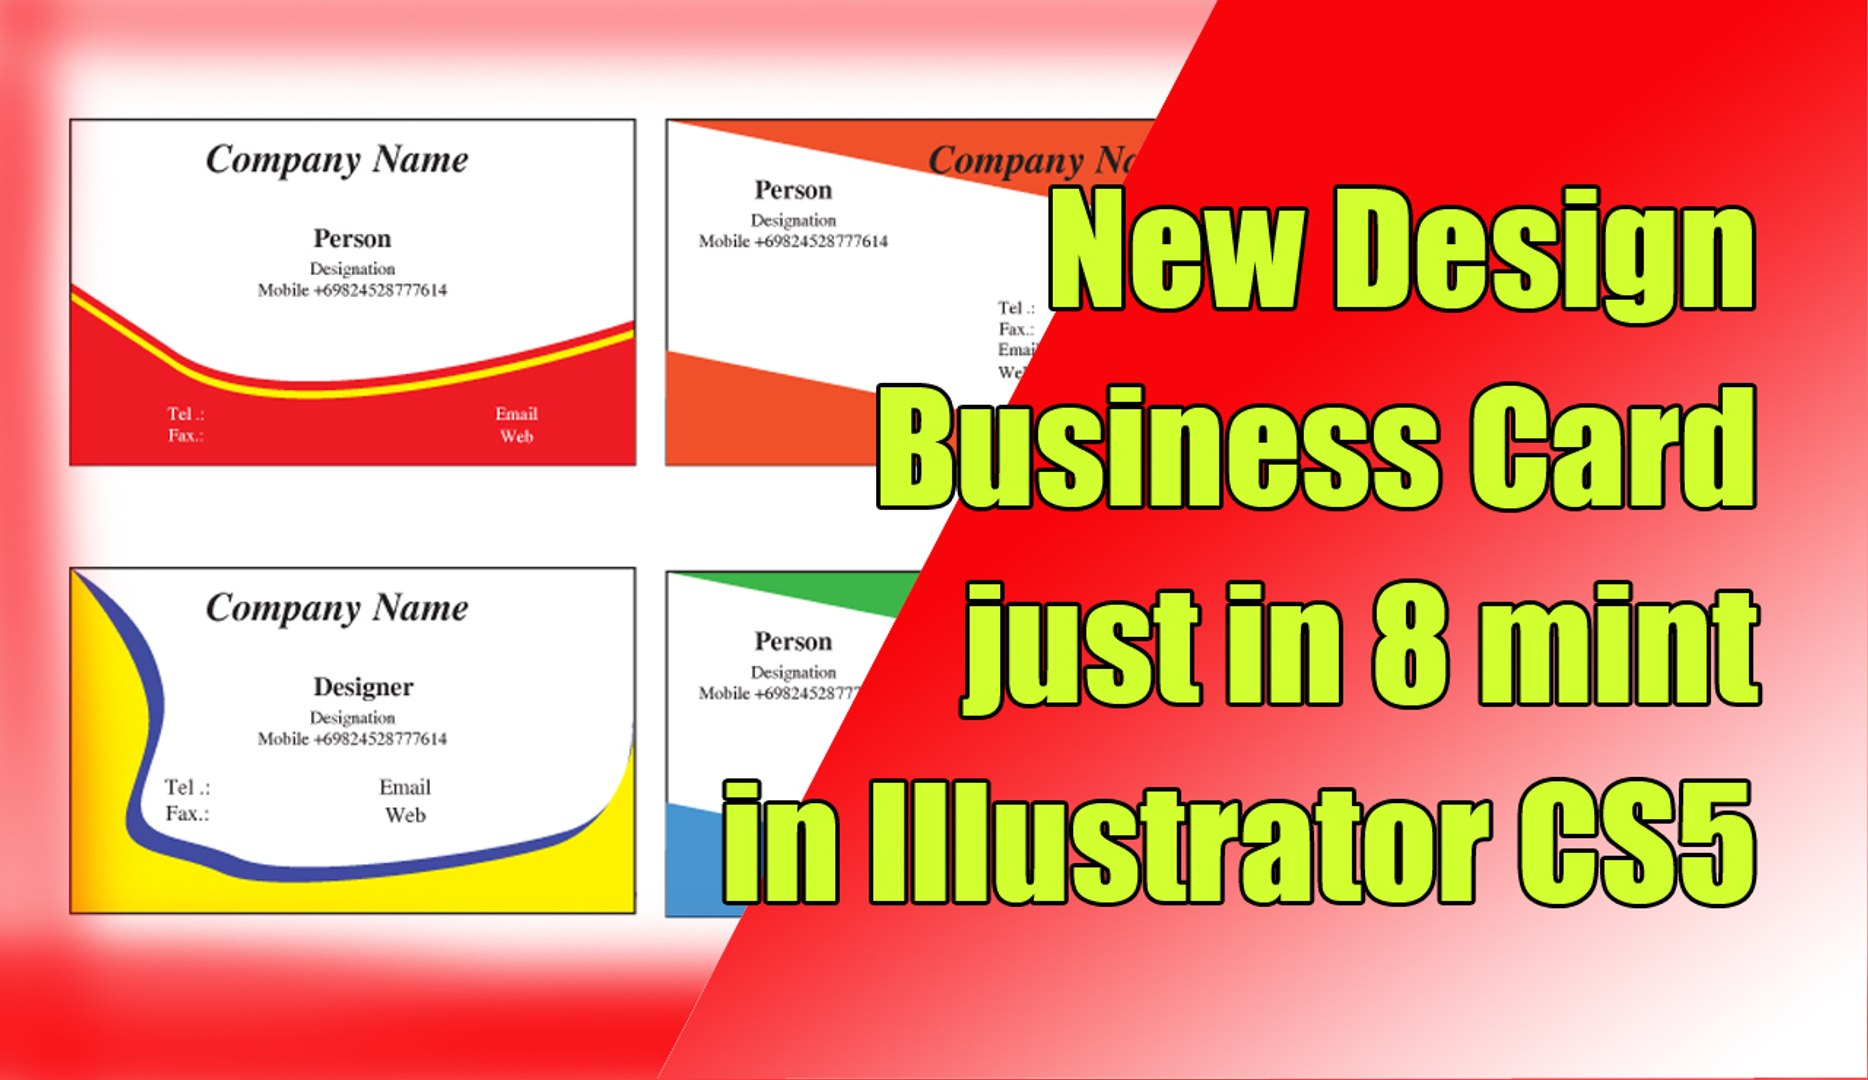 How to Make Business Card Design In Adobe Illustrator Cs5